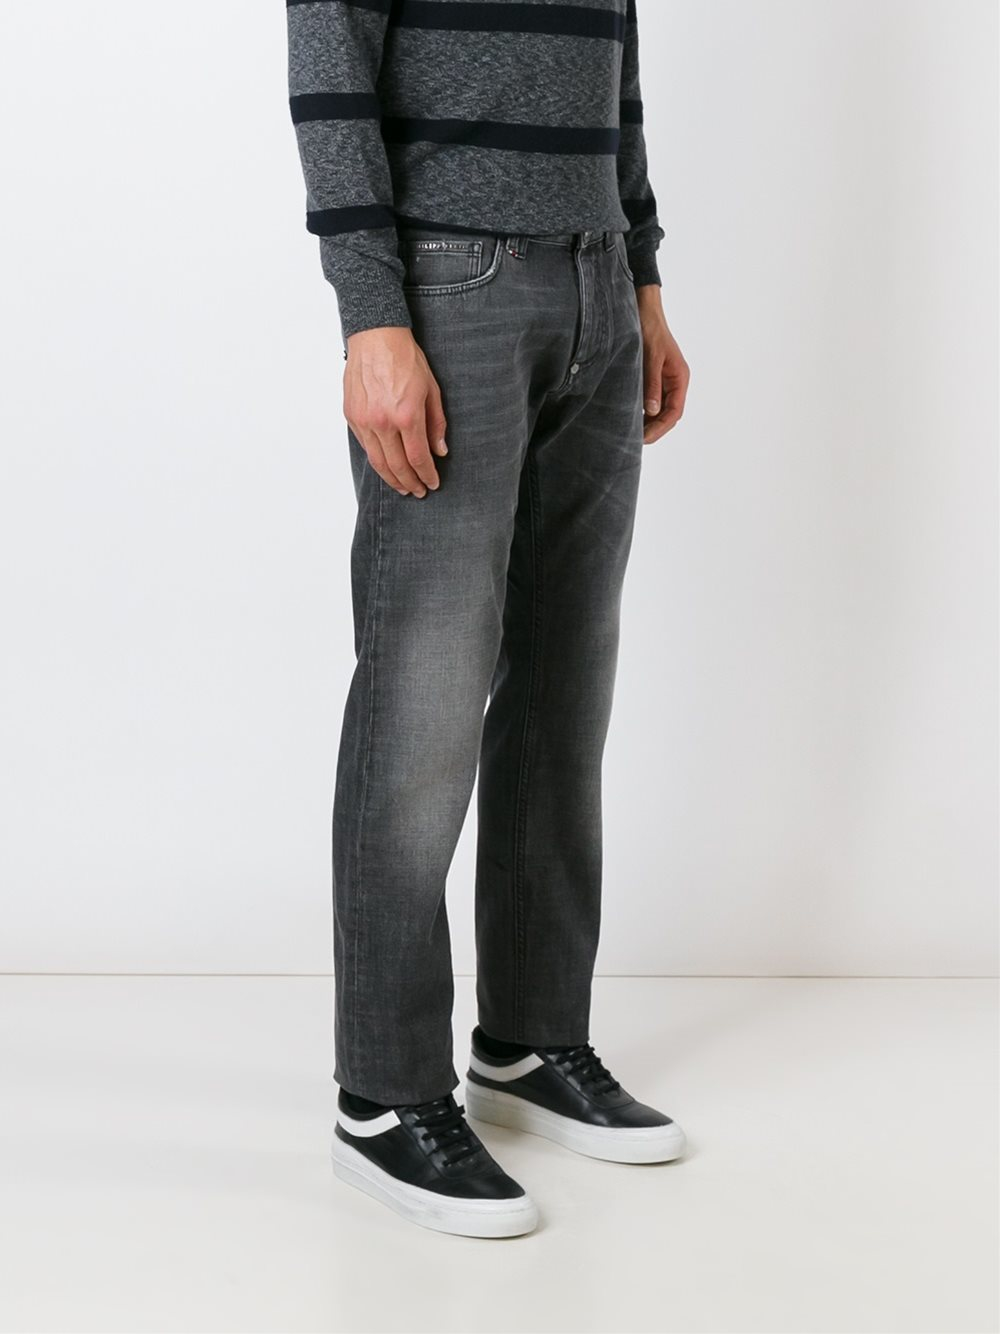 Philipp Plein Denim 'portofino' Jeans in Grey (Grey) for Men